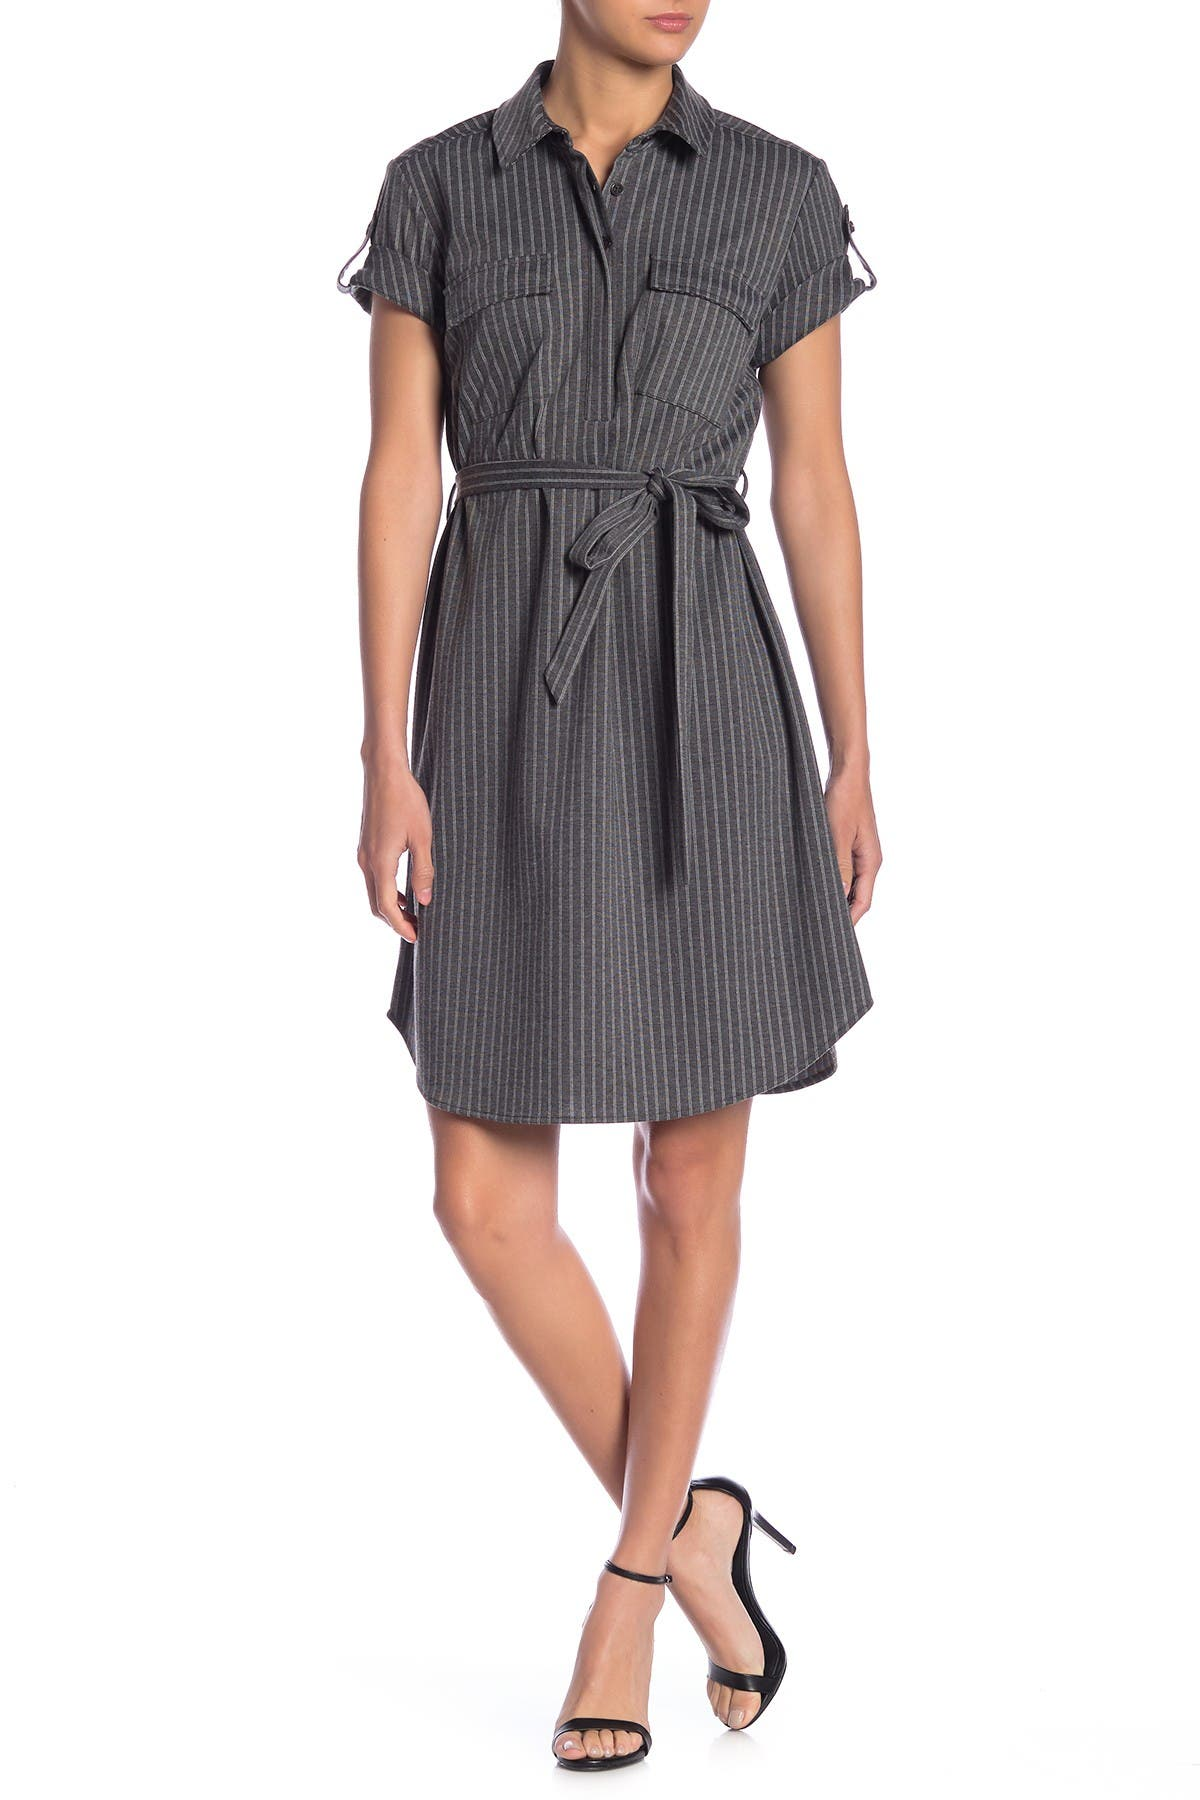 Image of Nanette Lepore Striped Short Sleeve Shirt Dress